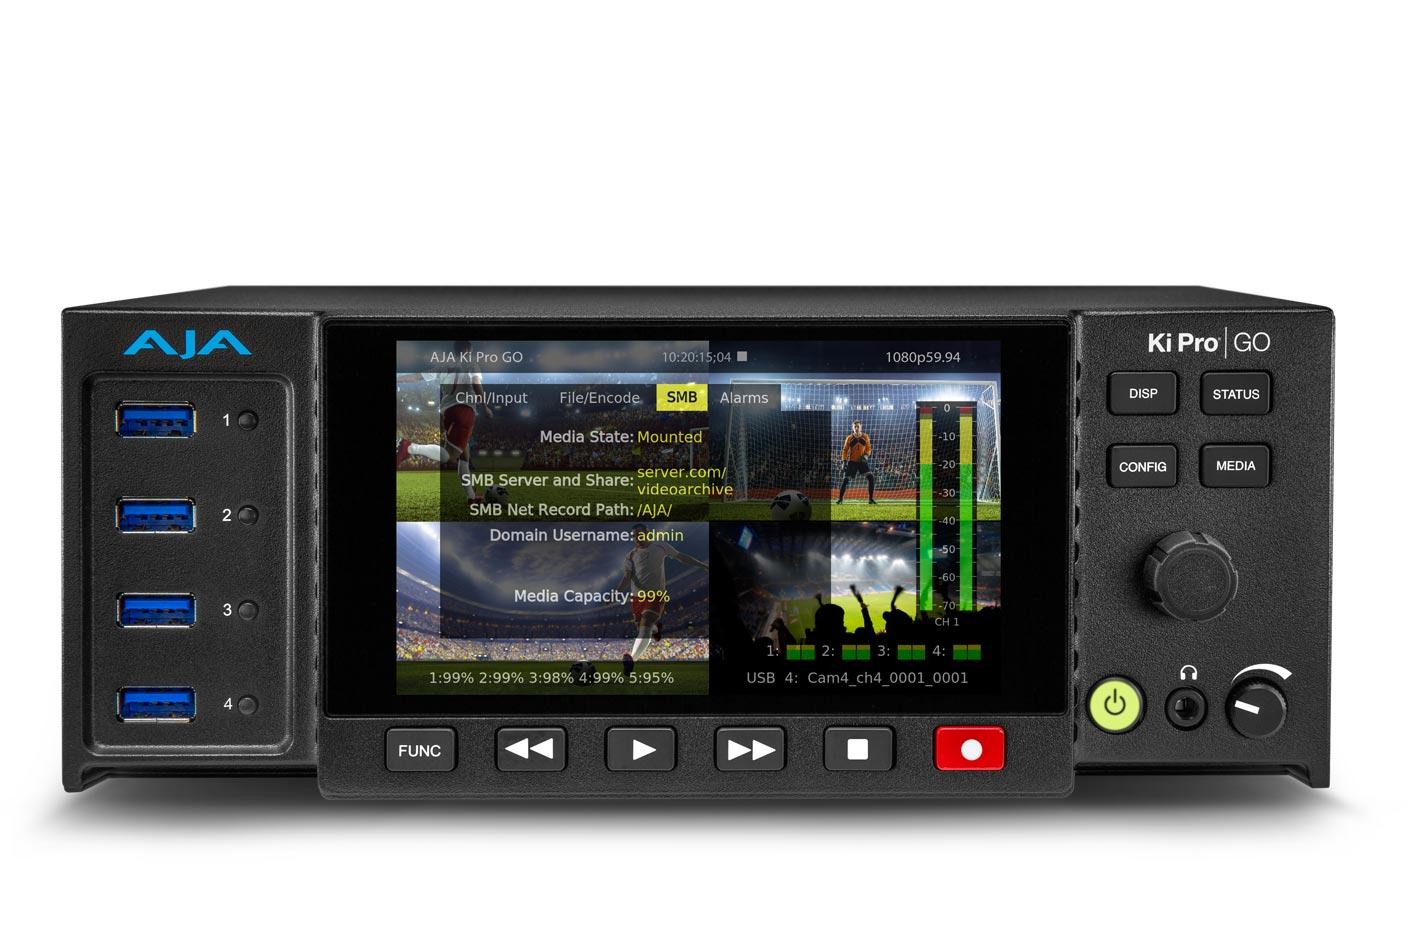 AJA Ki Pro GO v3.0 introduces expanded recording options 3